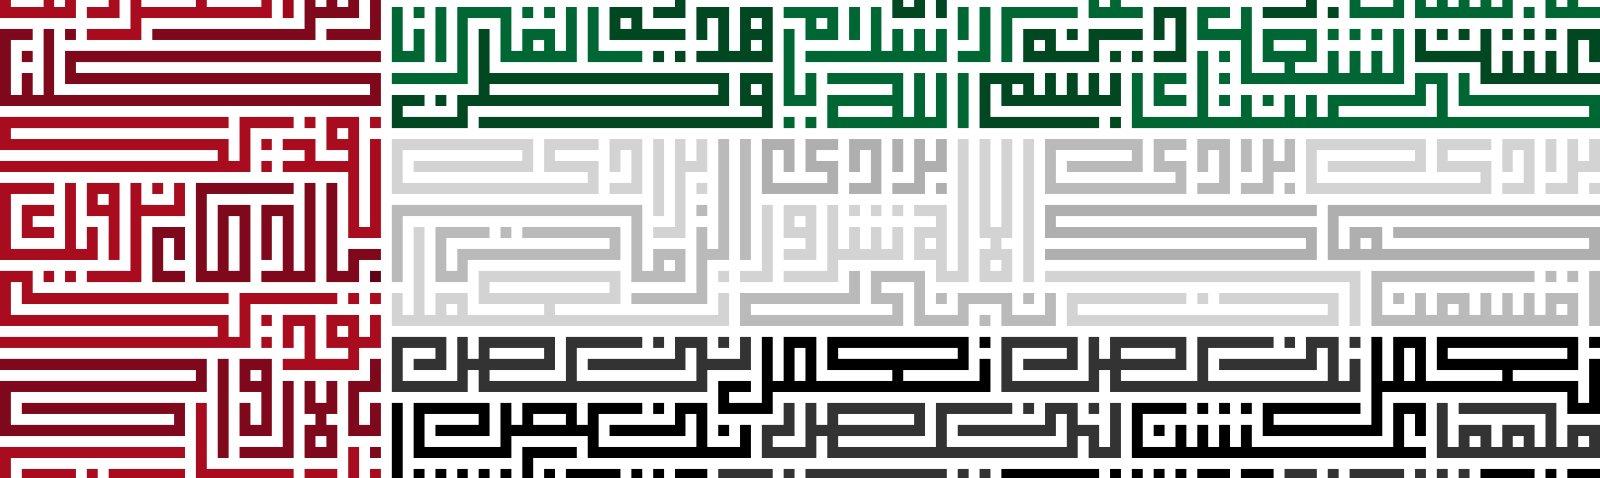 UAE MAZE.jpg